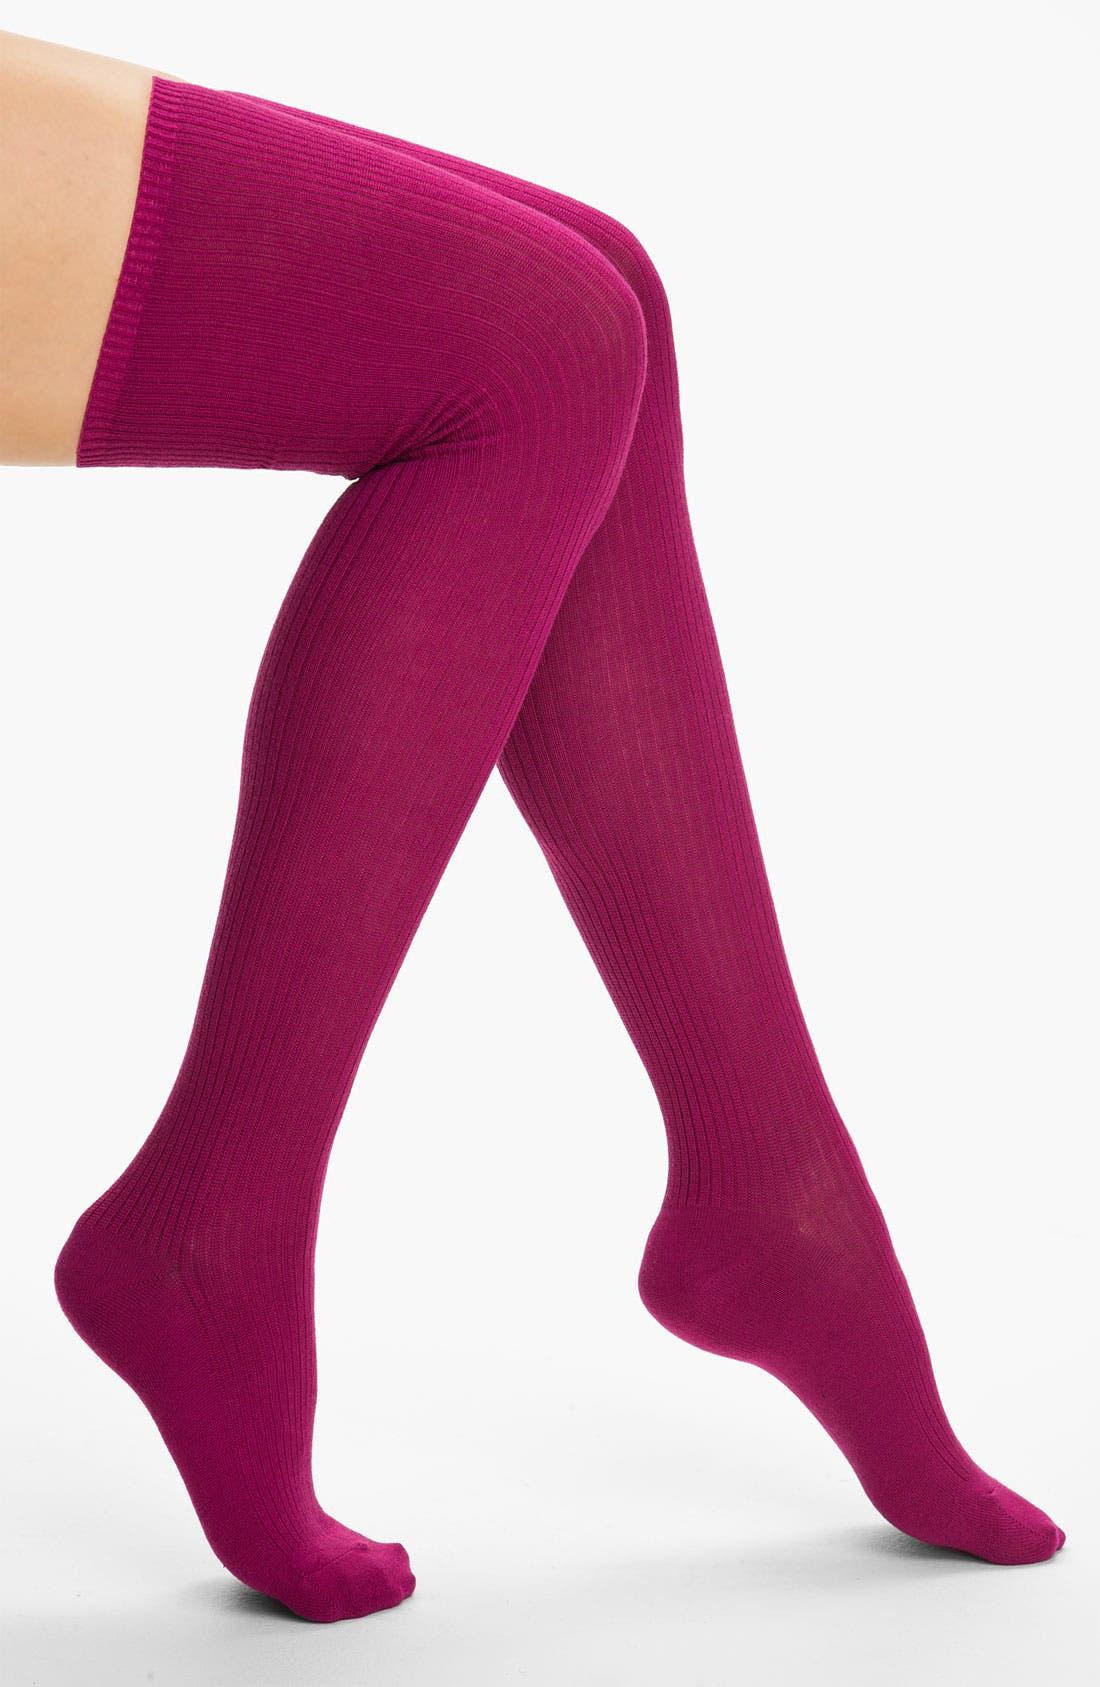 Alternate Image 1 Selected - Hue Ribbed Over the Knee Socks